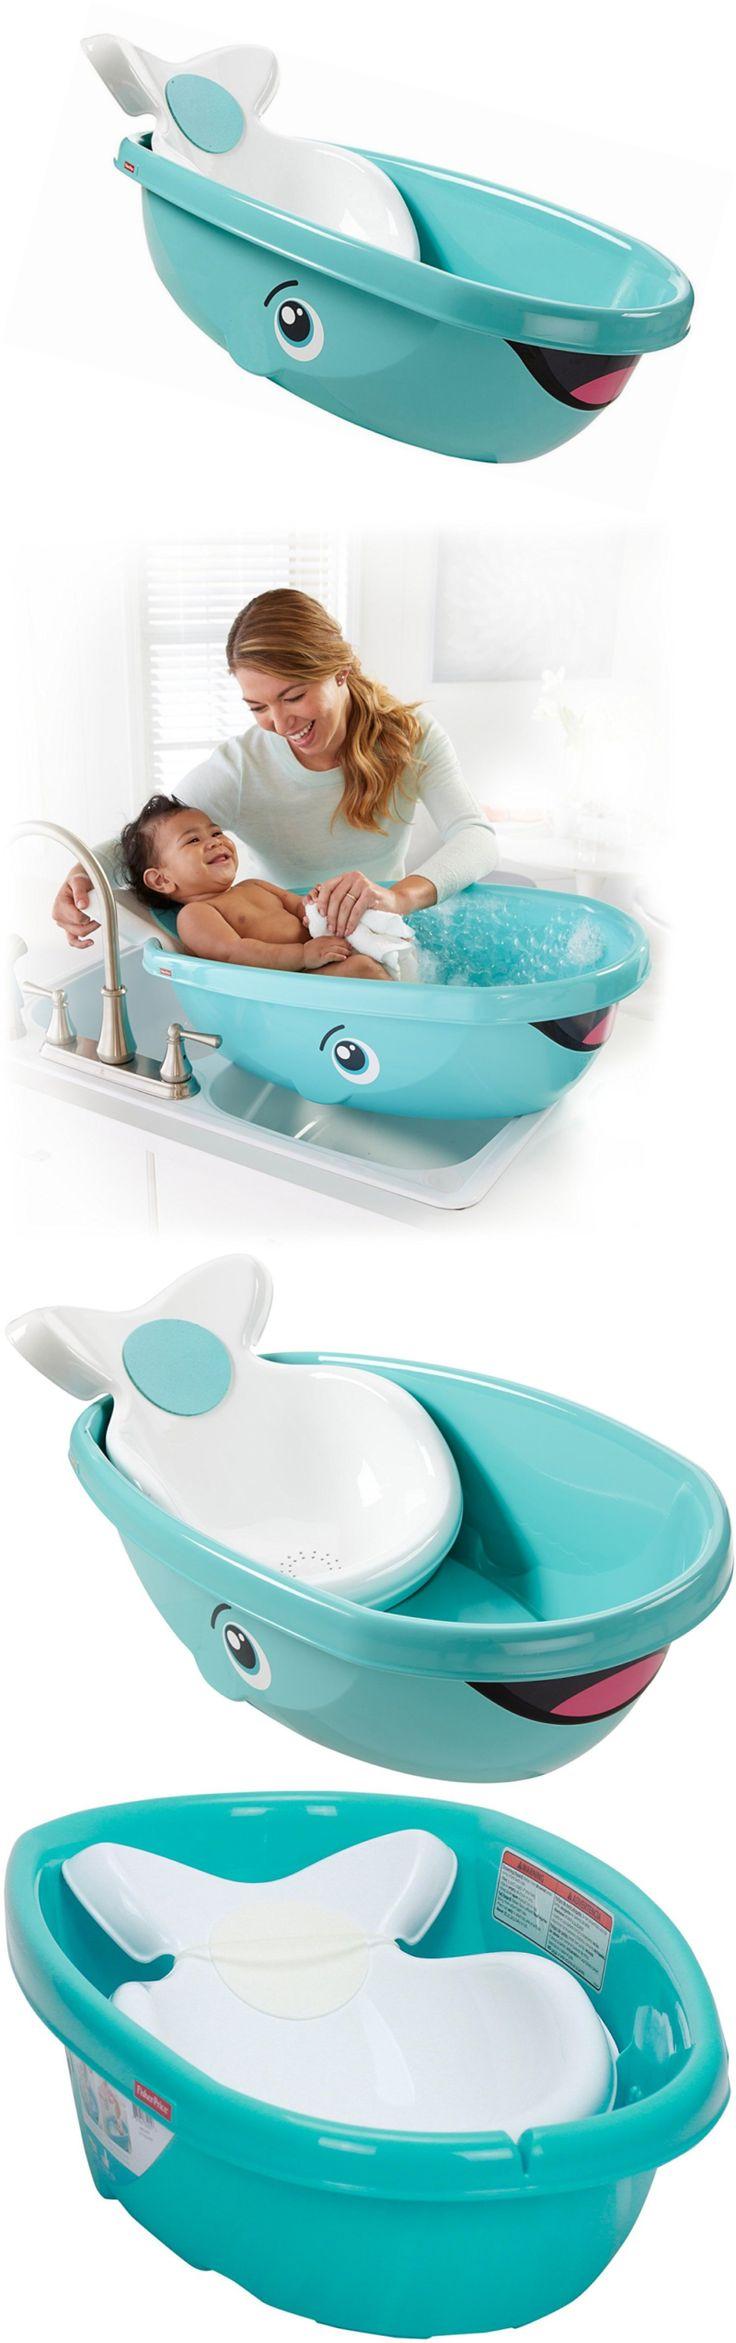 Best 25+ Bathtub price ideas on Pinterest   Rustic shower ...